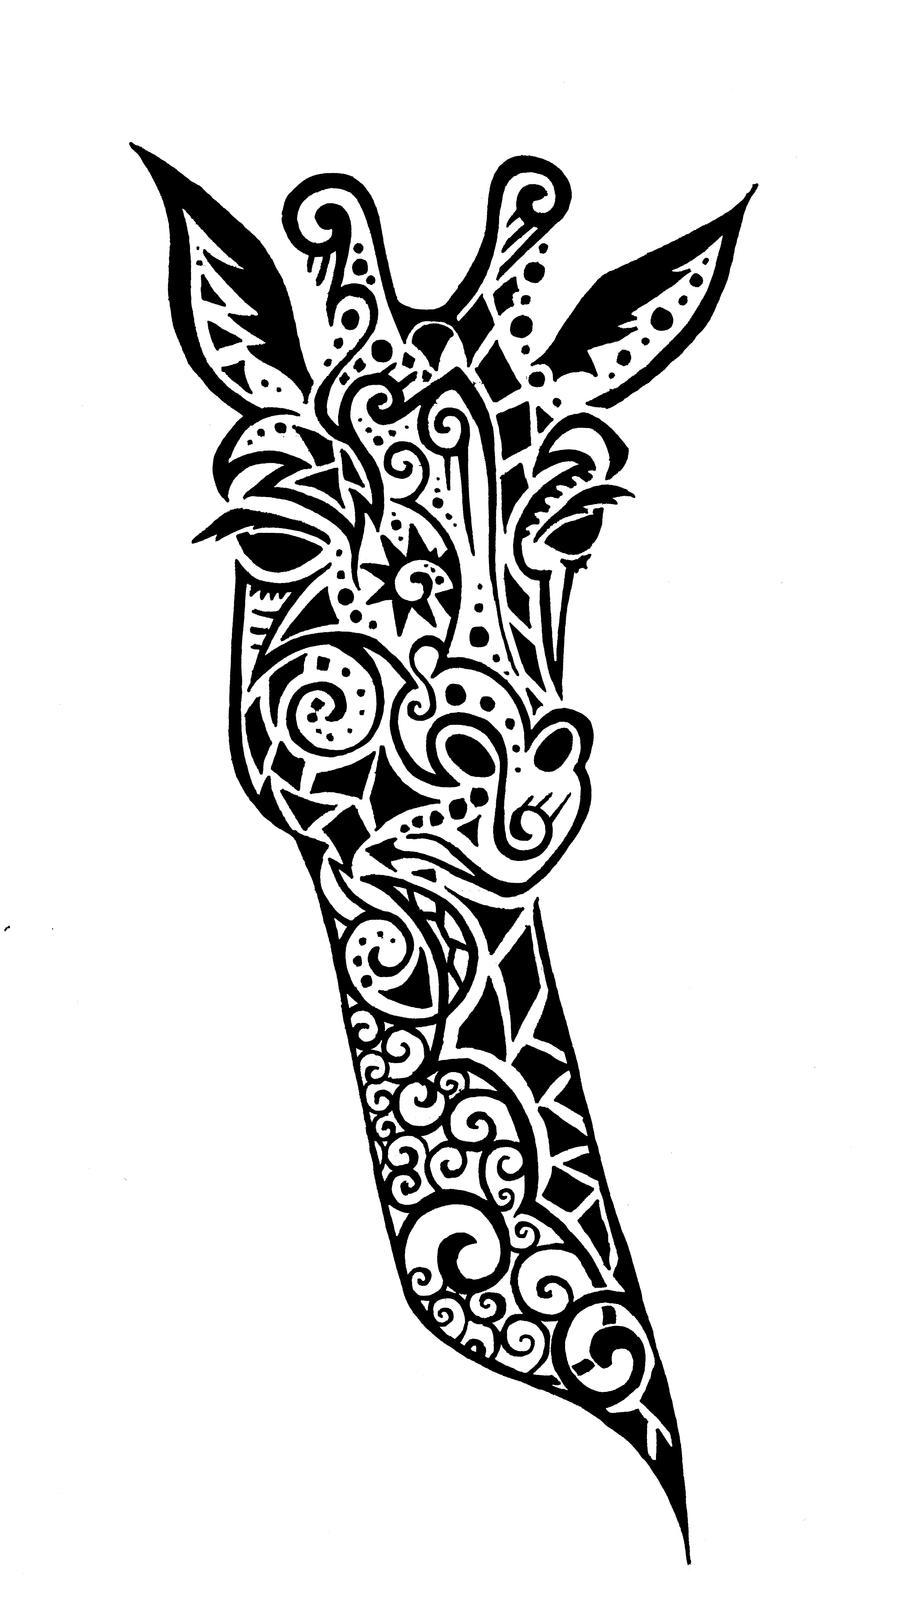 Tribal giraffe tattoo - photo#29